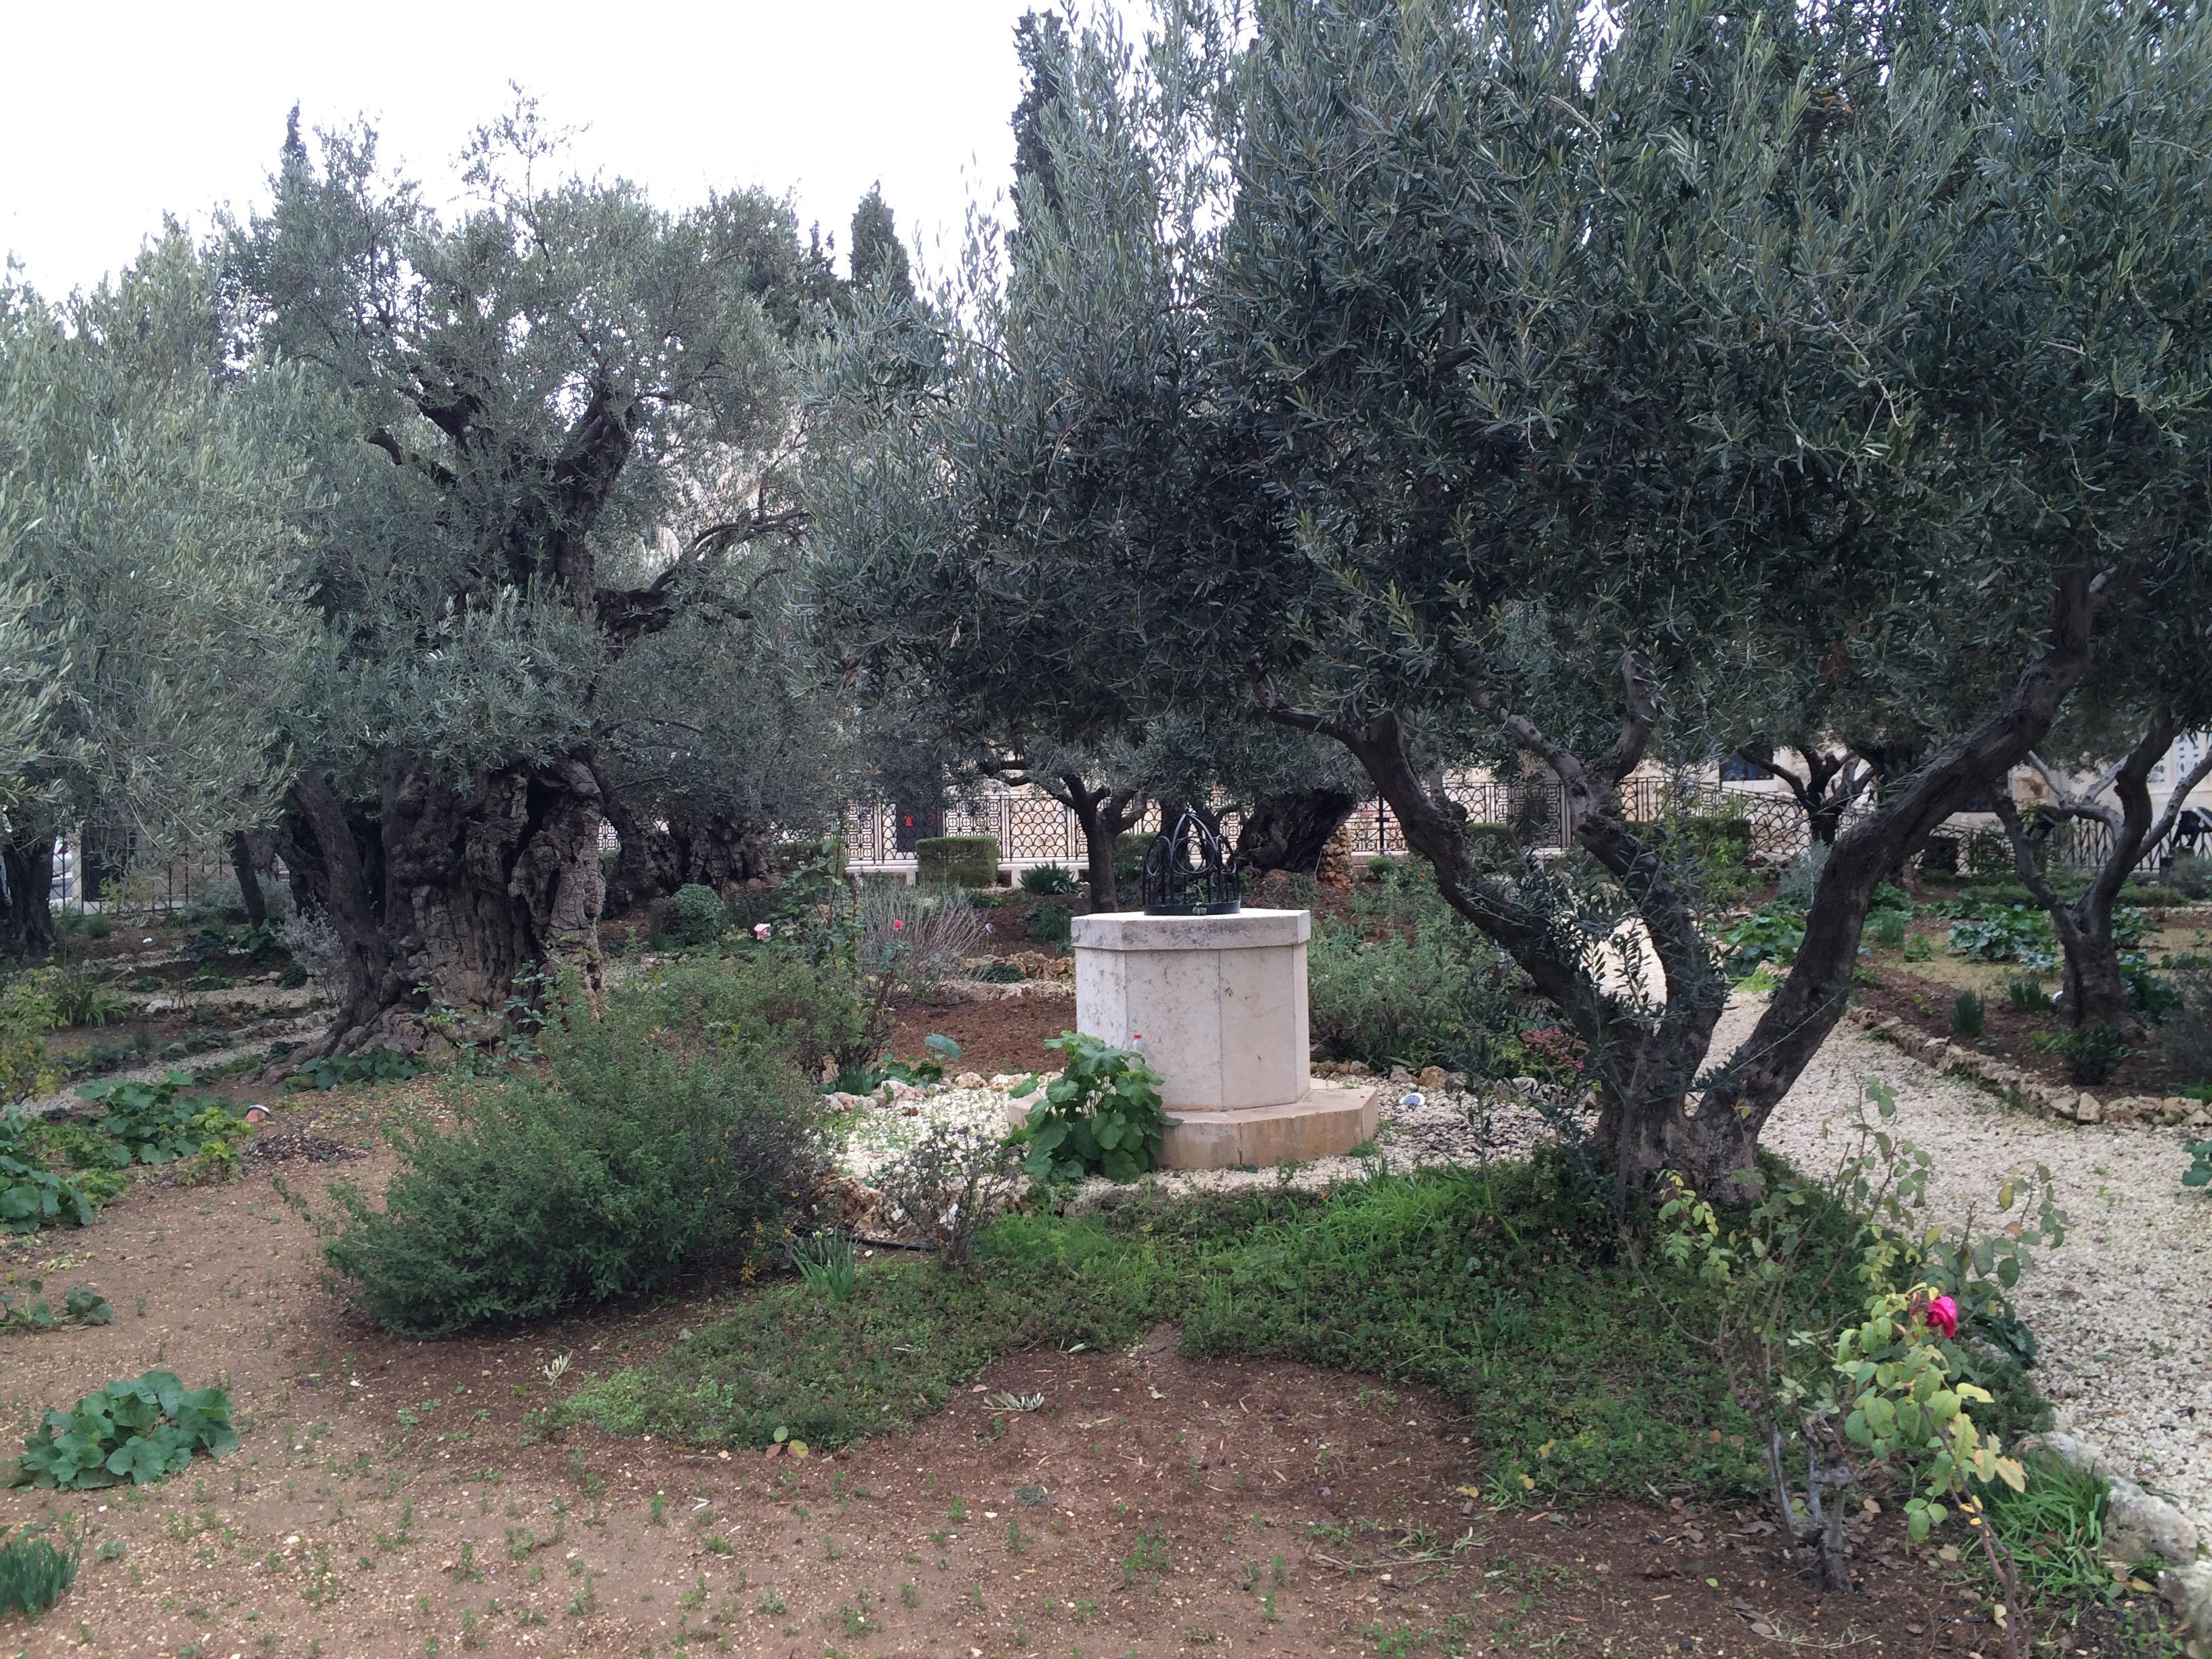 What happened garden of gethsemane garden ftempo for Garden state parkway toll calculator